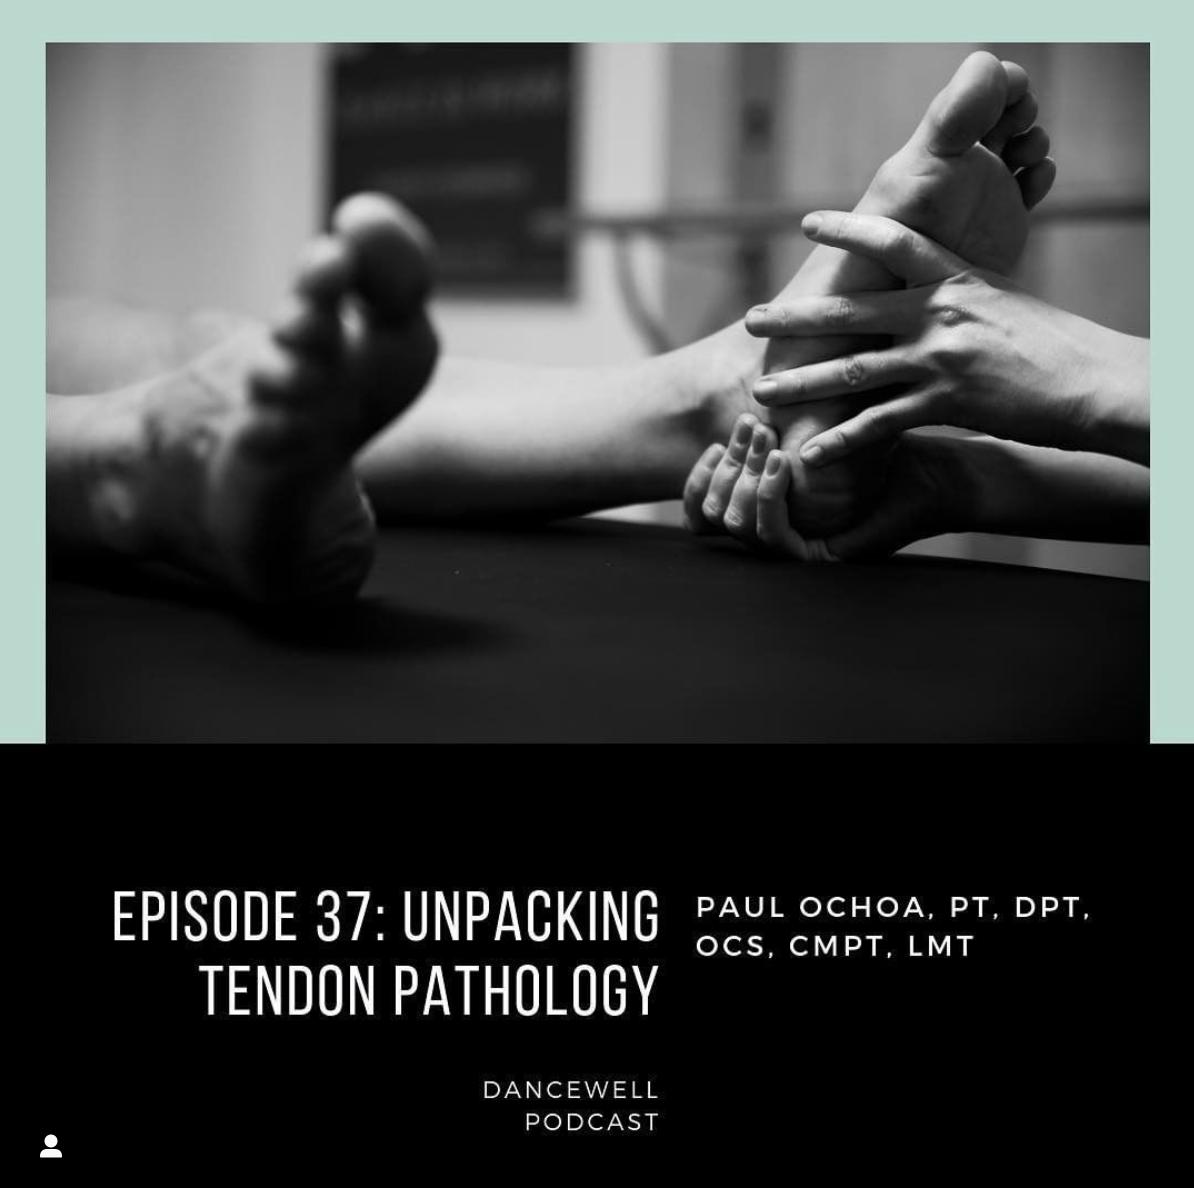 DanceWell Podcast: Unpacking Tendon Pathology